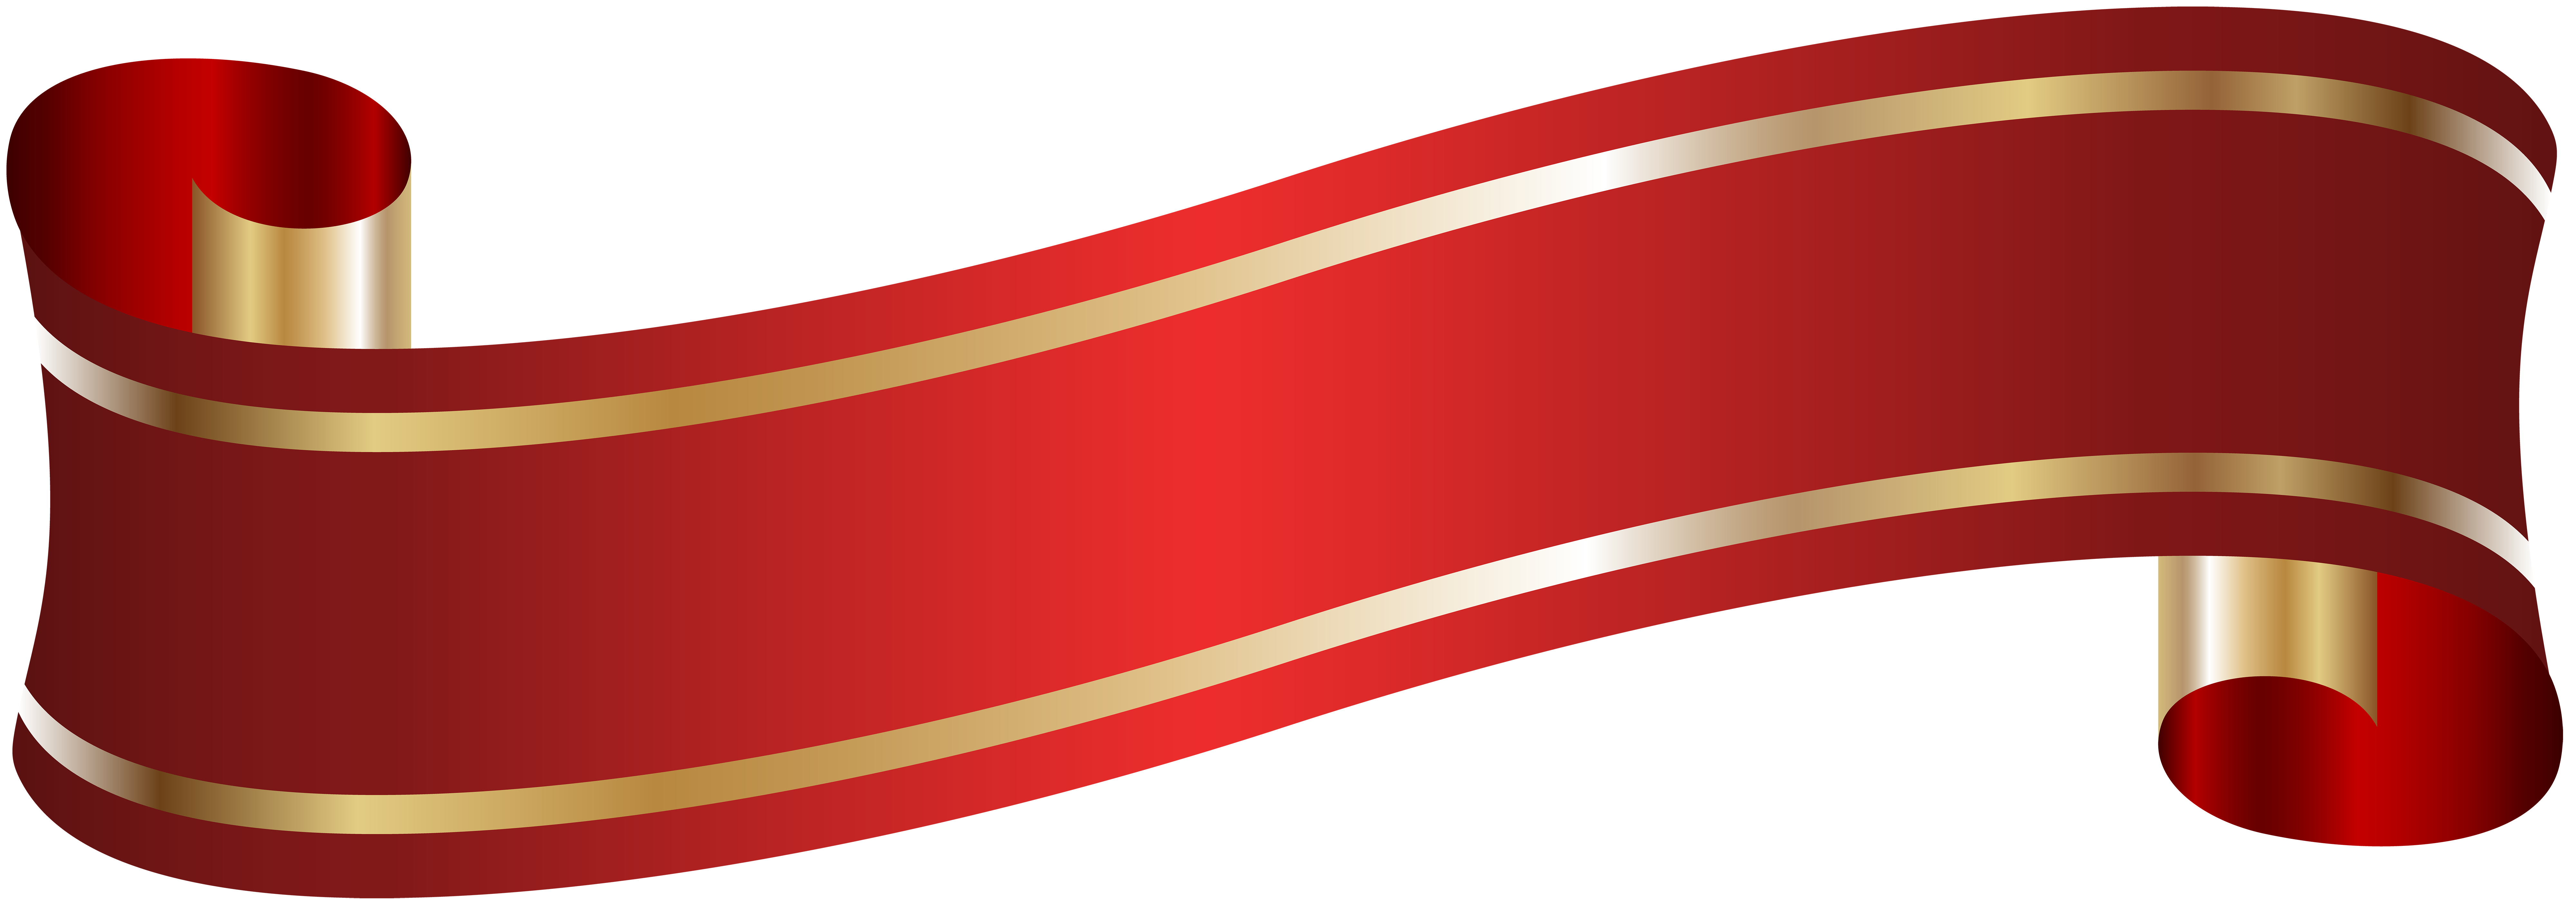 8000x2822 Elegant Banner Red Png Clip Artu200b Gallery Yopriceville